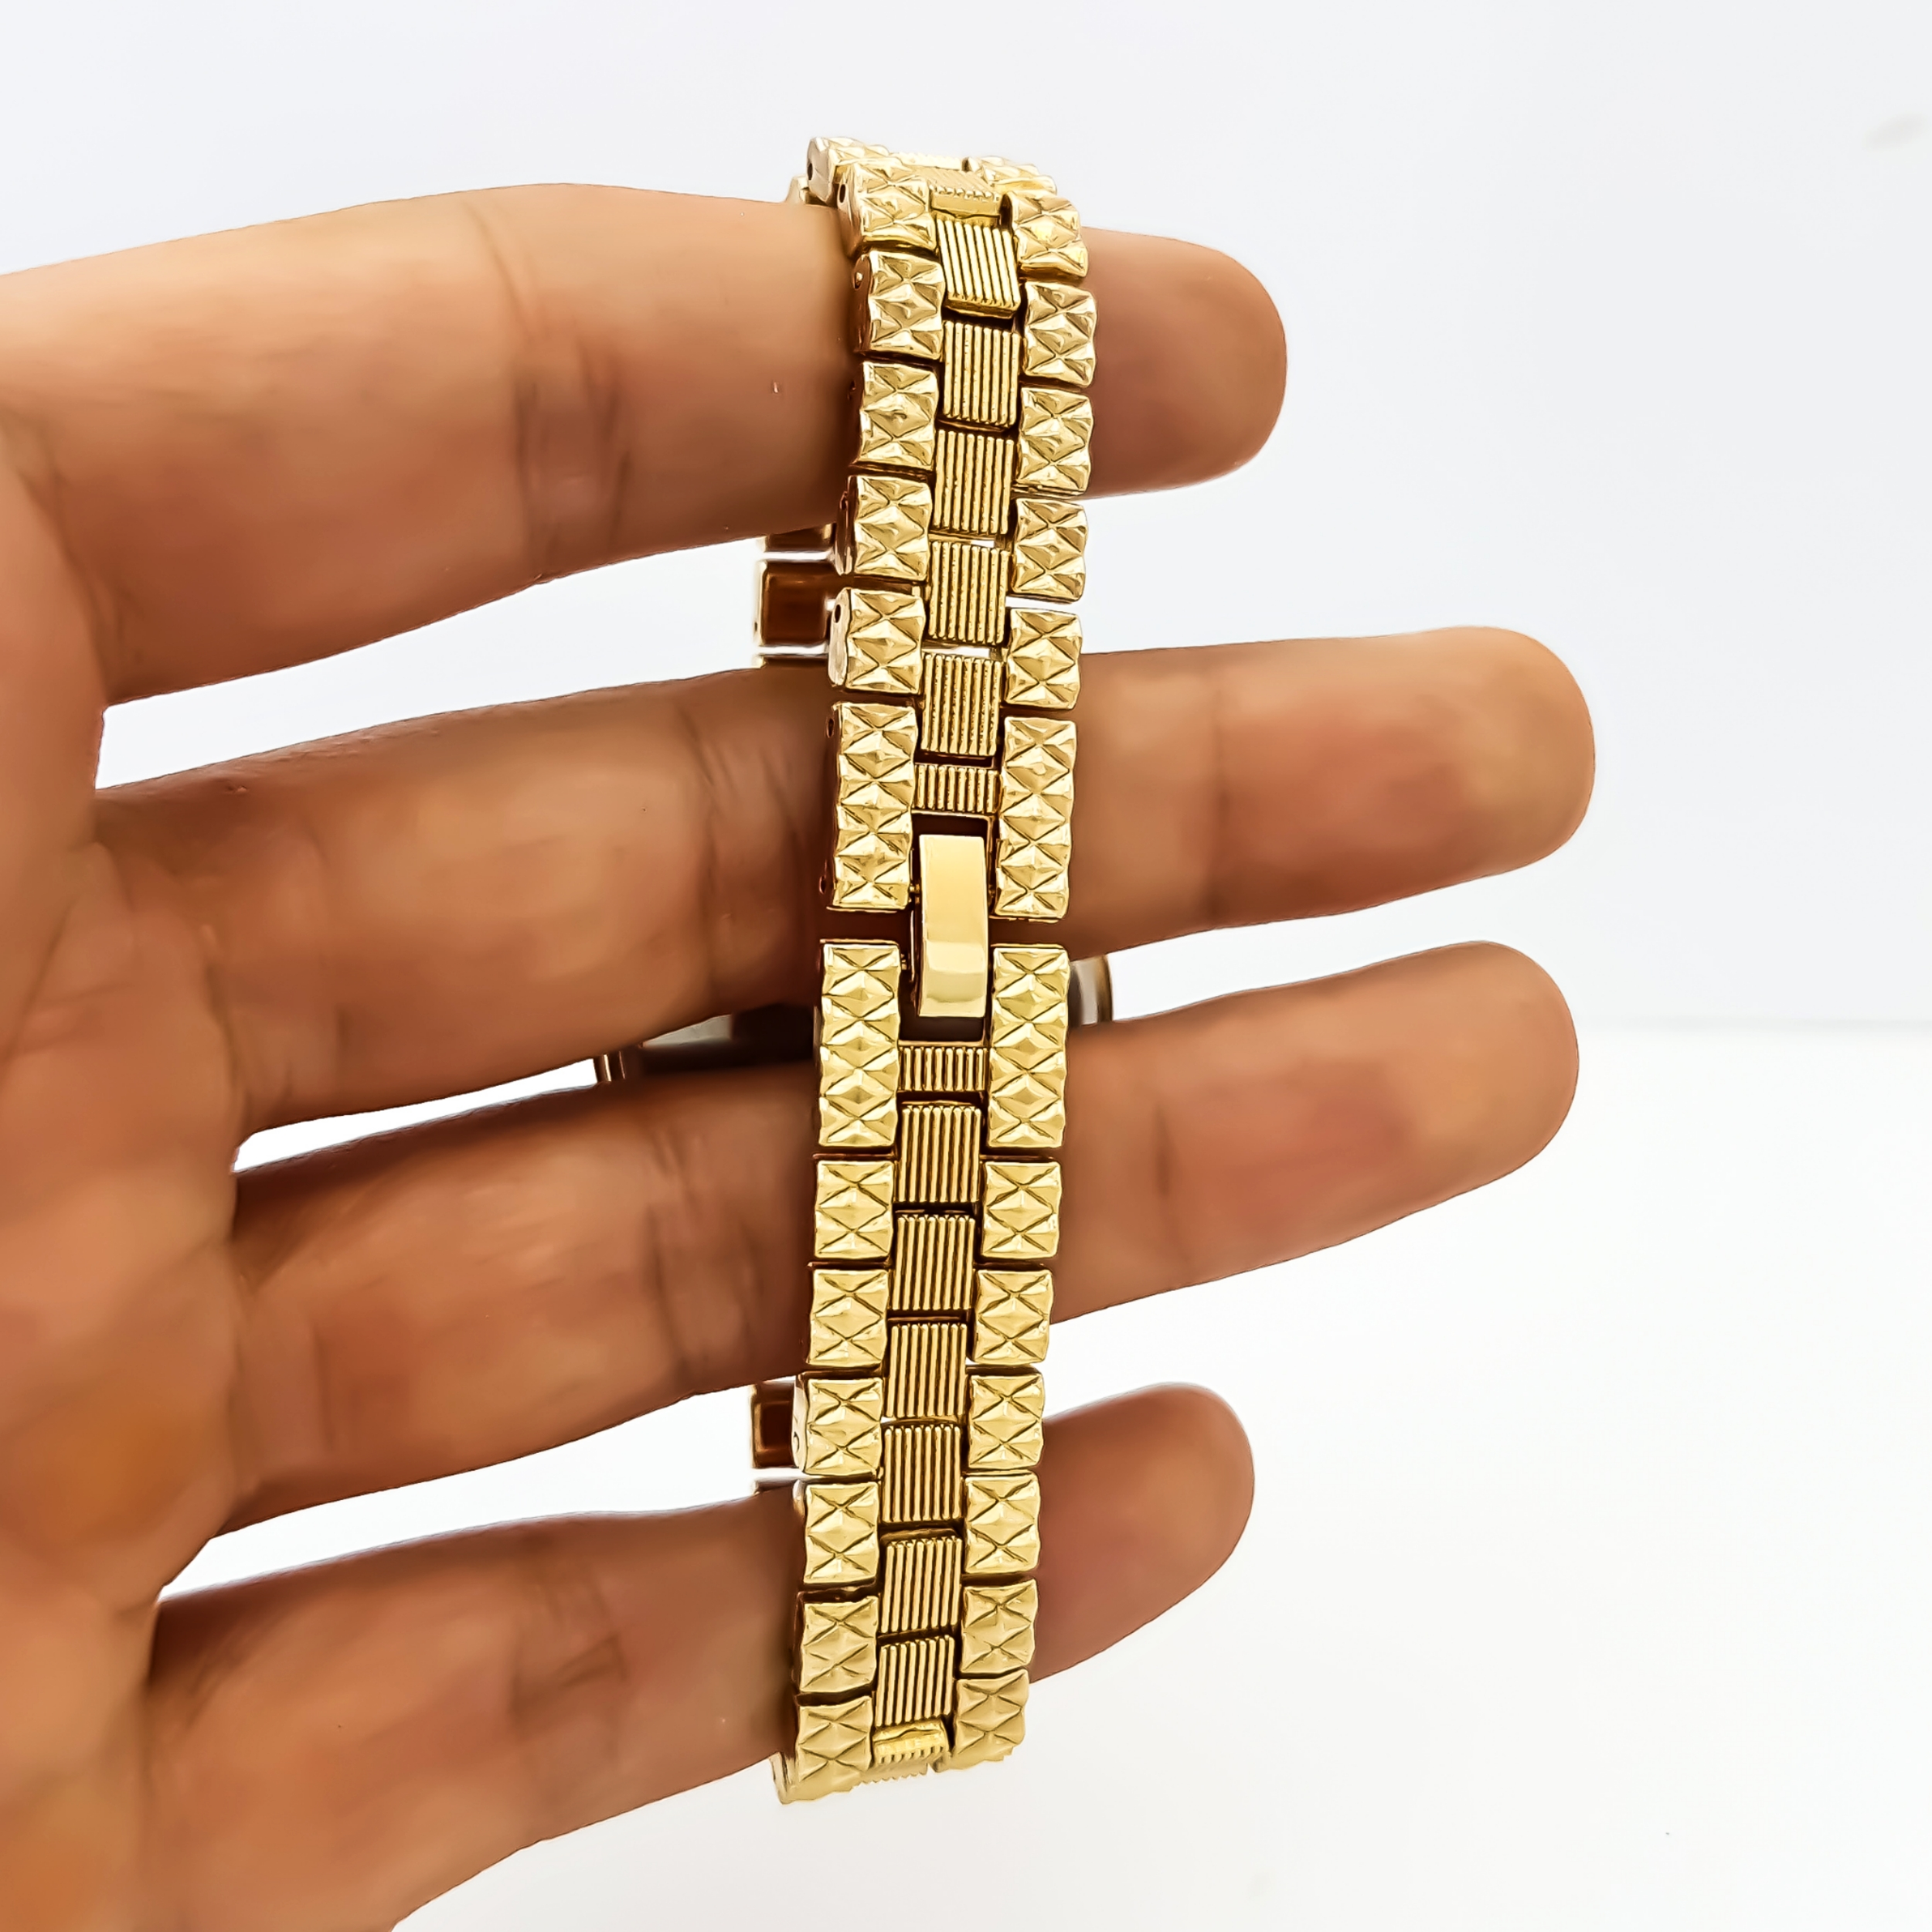 ساعت مچی  زنانه کد VS 9631              اصل